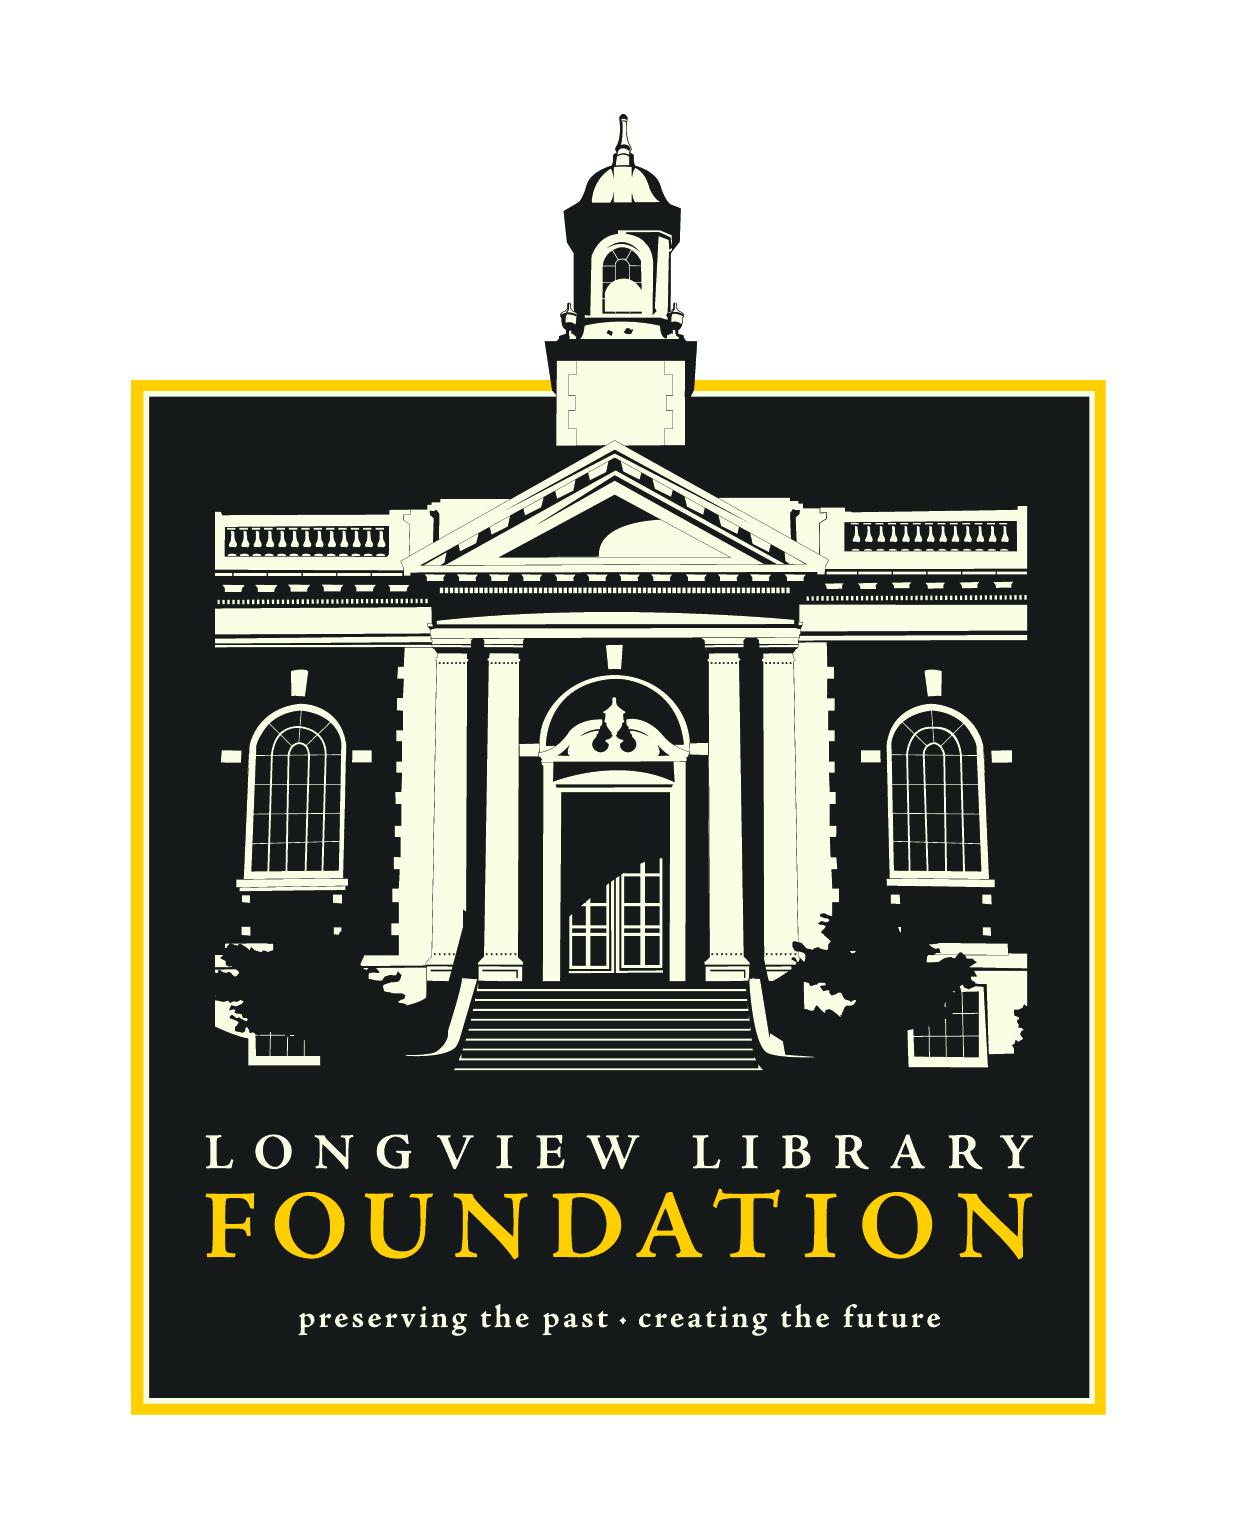 Longview Library Foundation